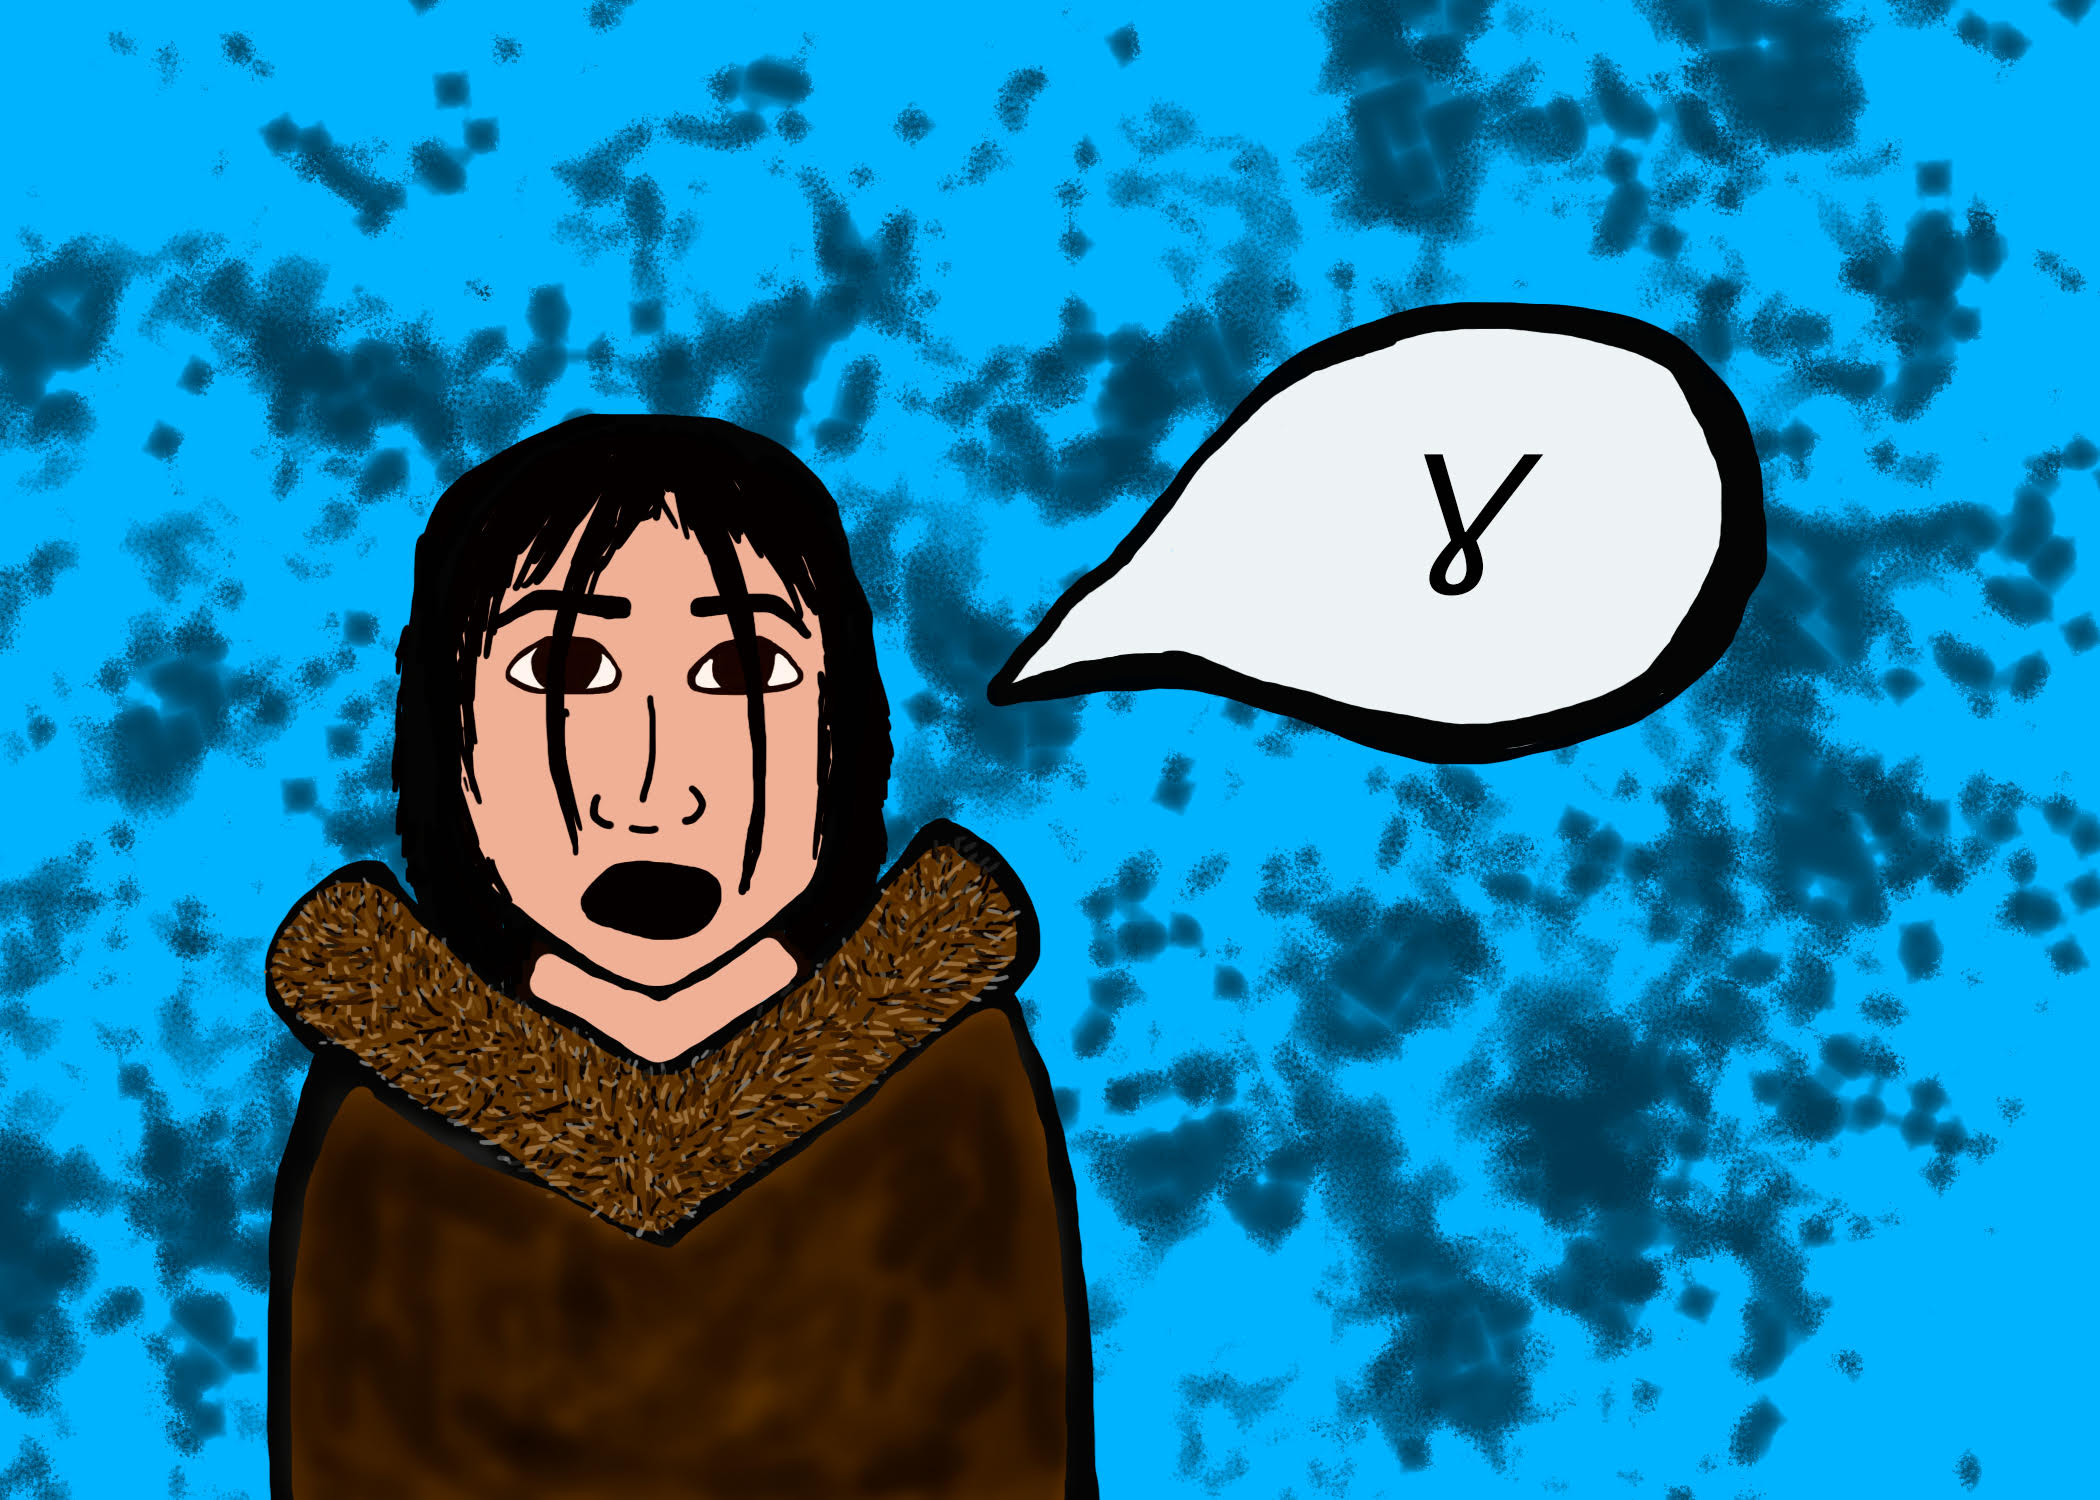 Voiced velar fricative